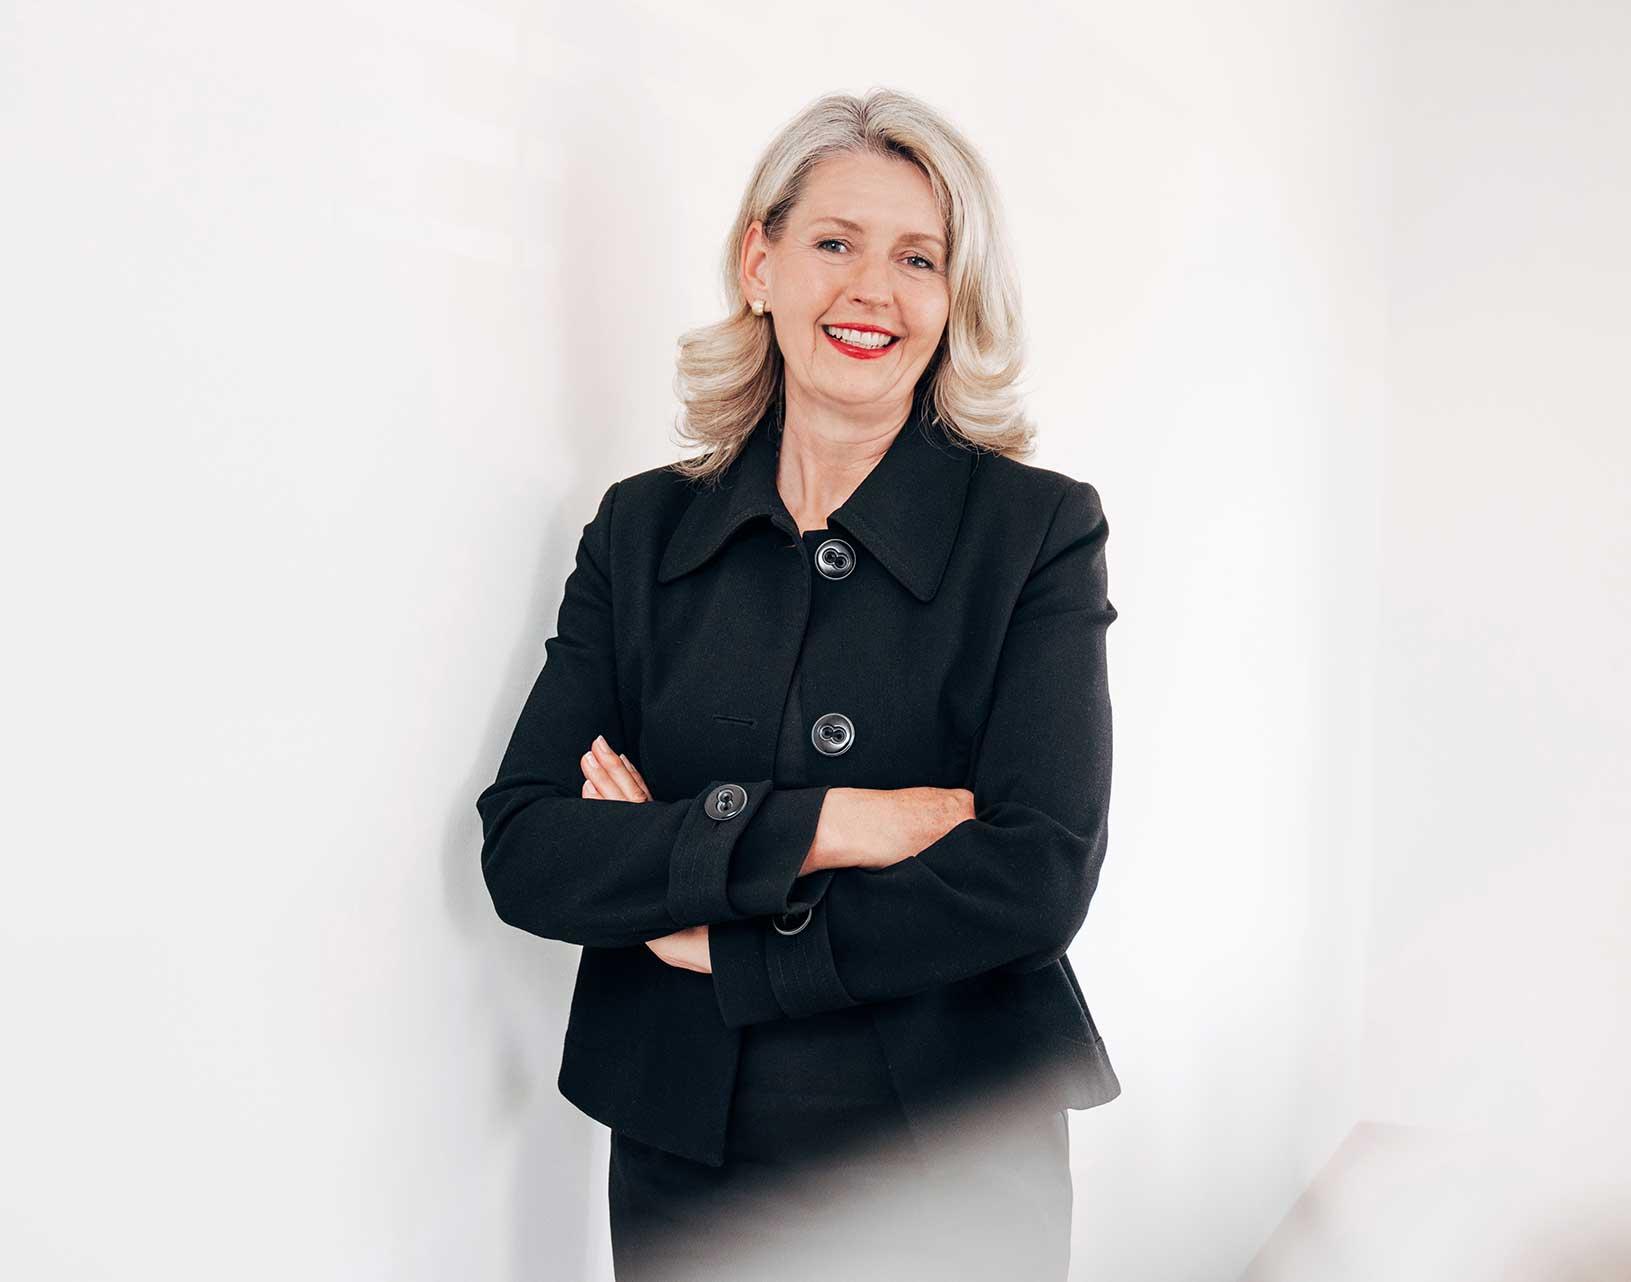 <b>Christiane Konrad</b><br/> Assistentin der Geschäftsführung Datenschutzkoordinatorin